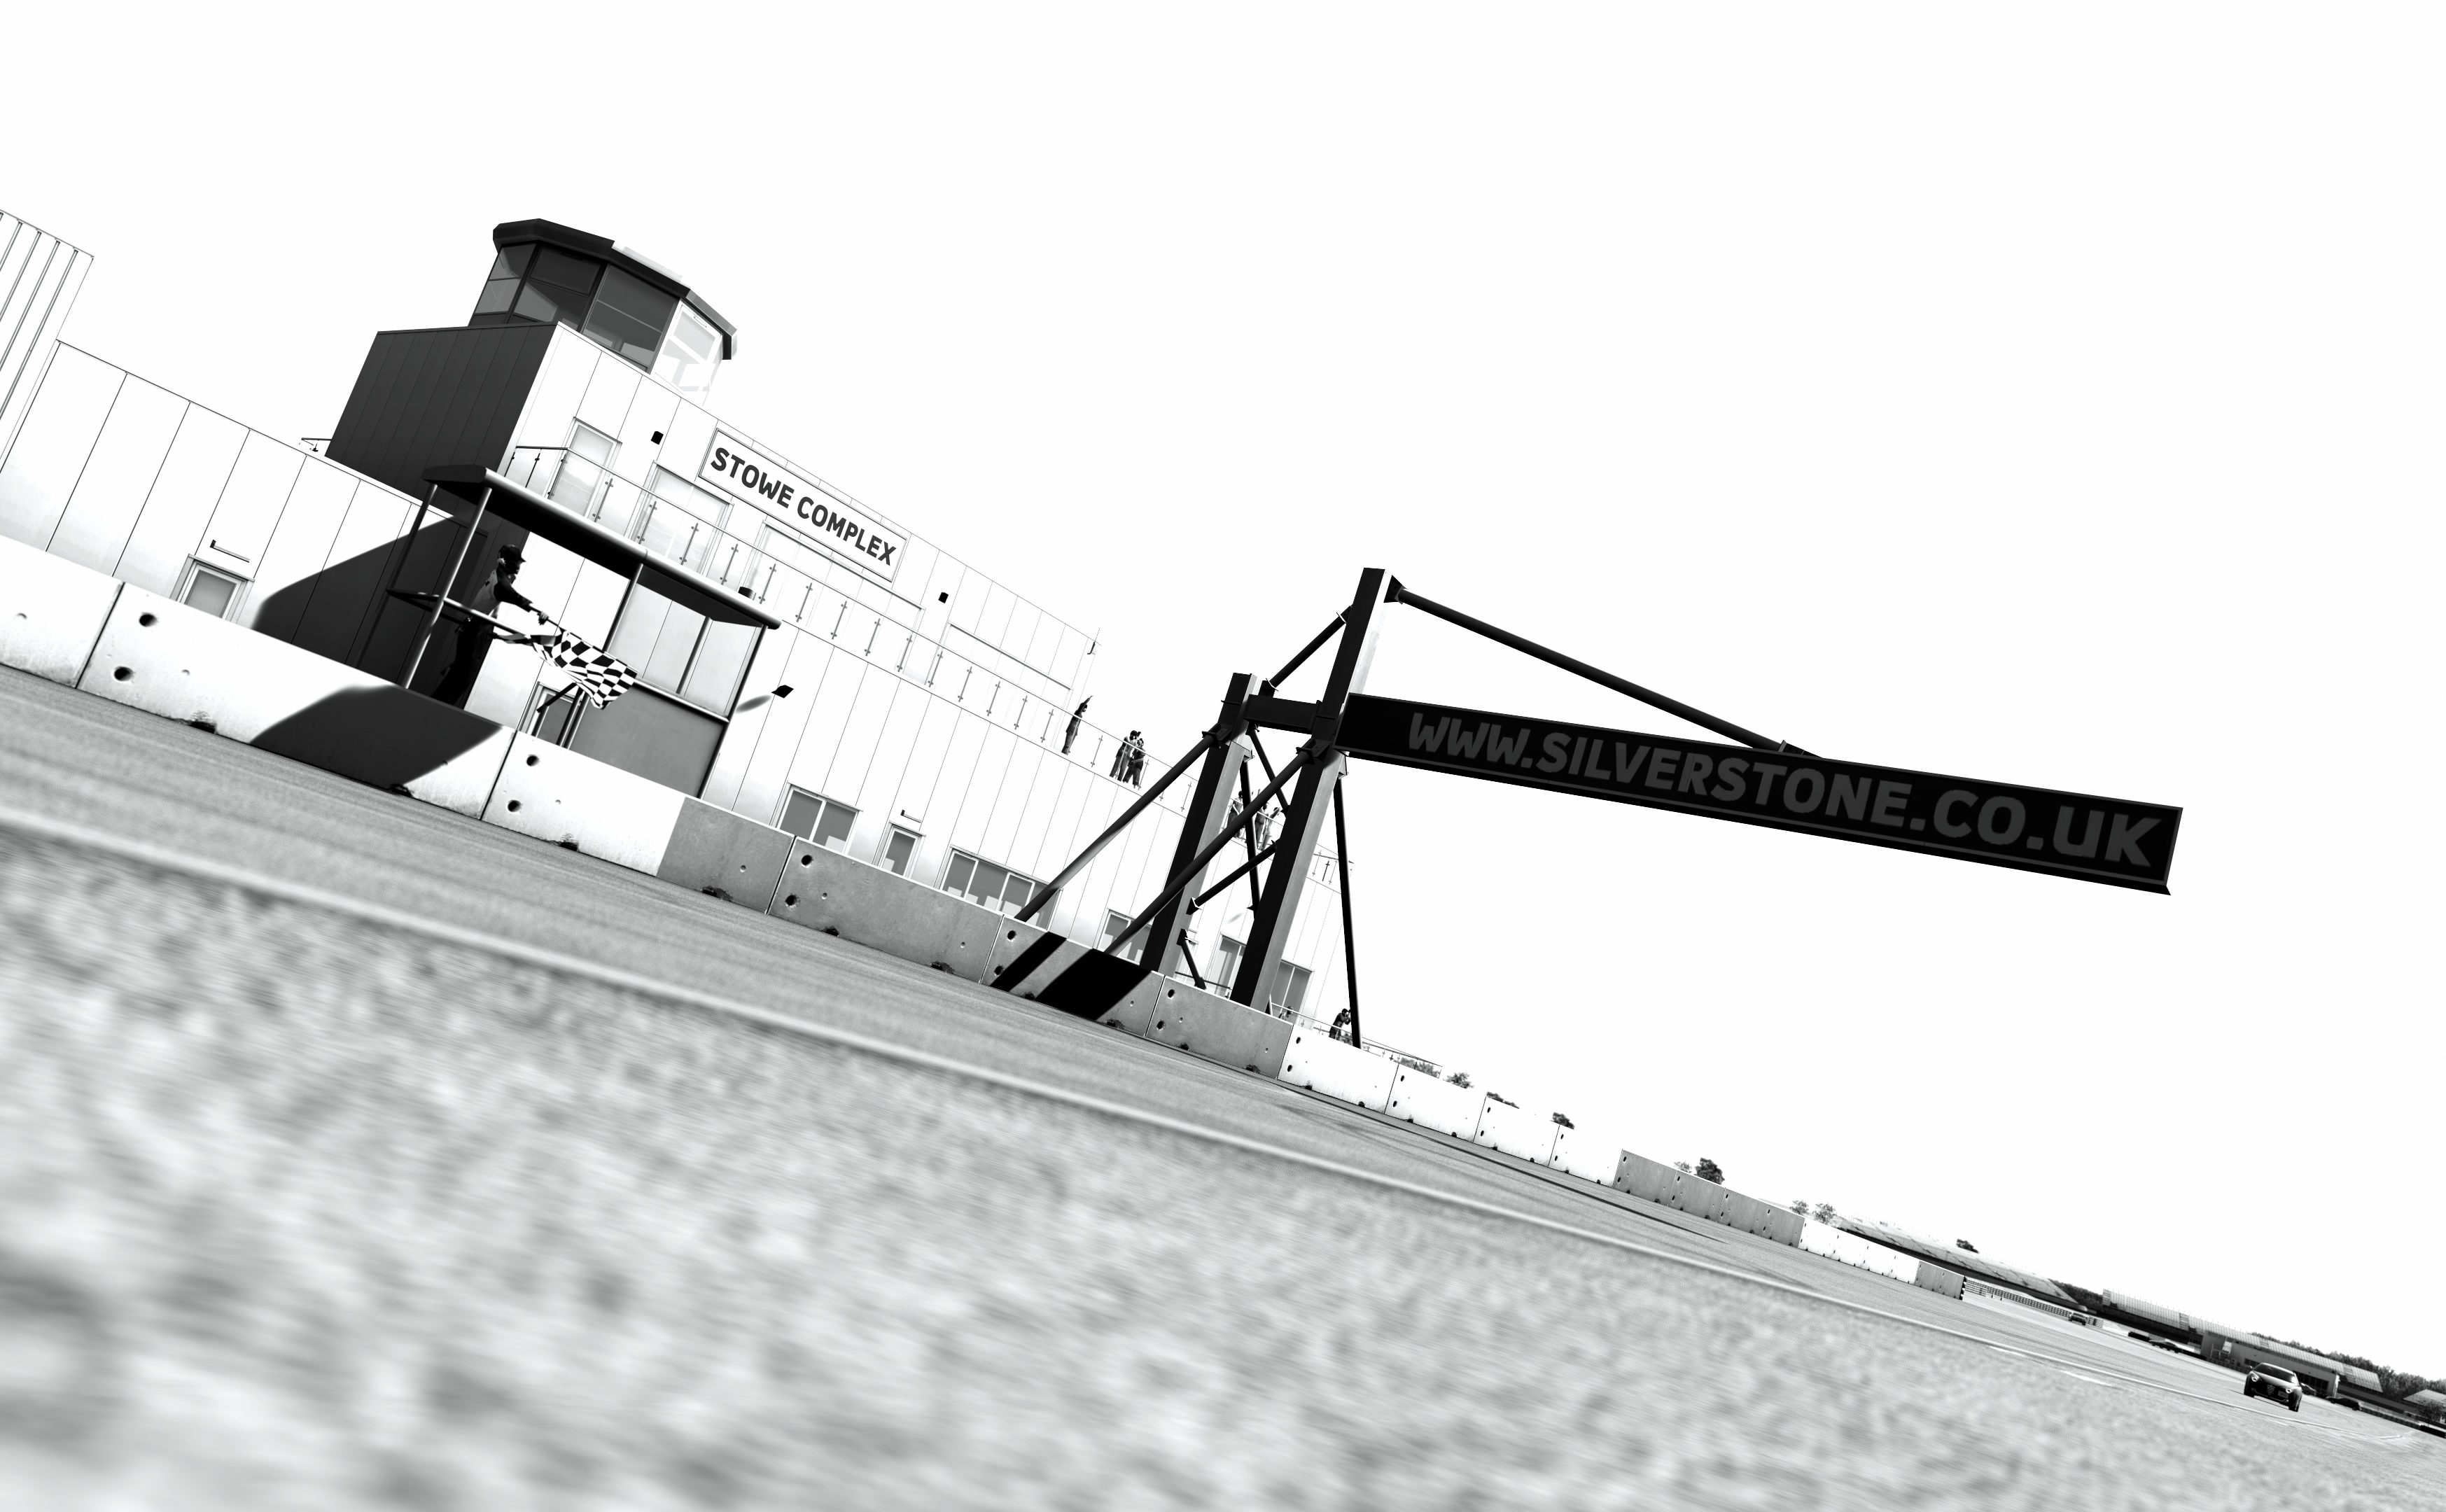 Silverstone_ Stowe Circuit_3.jpg